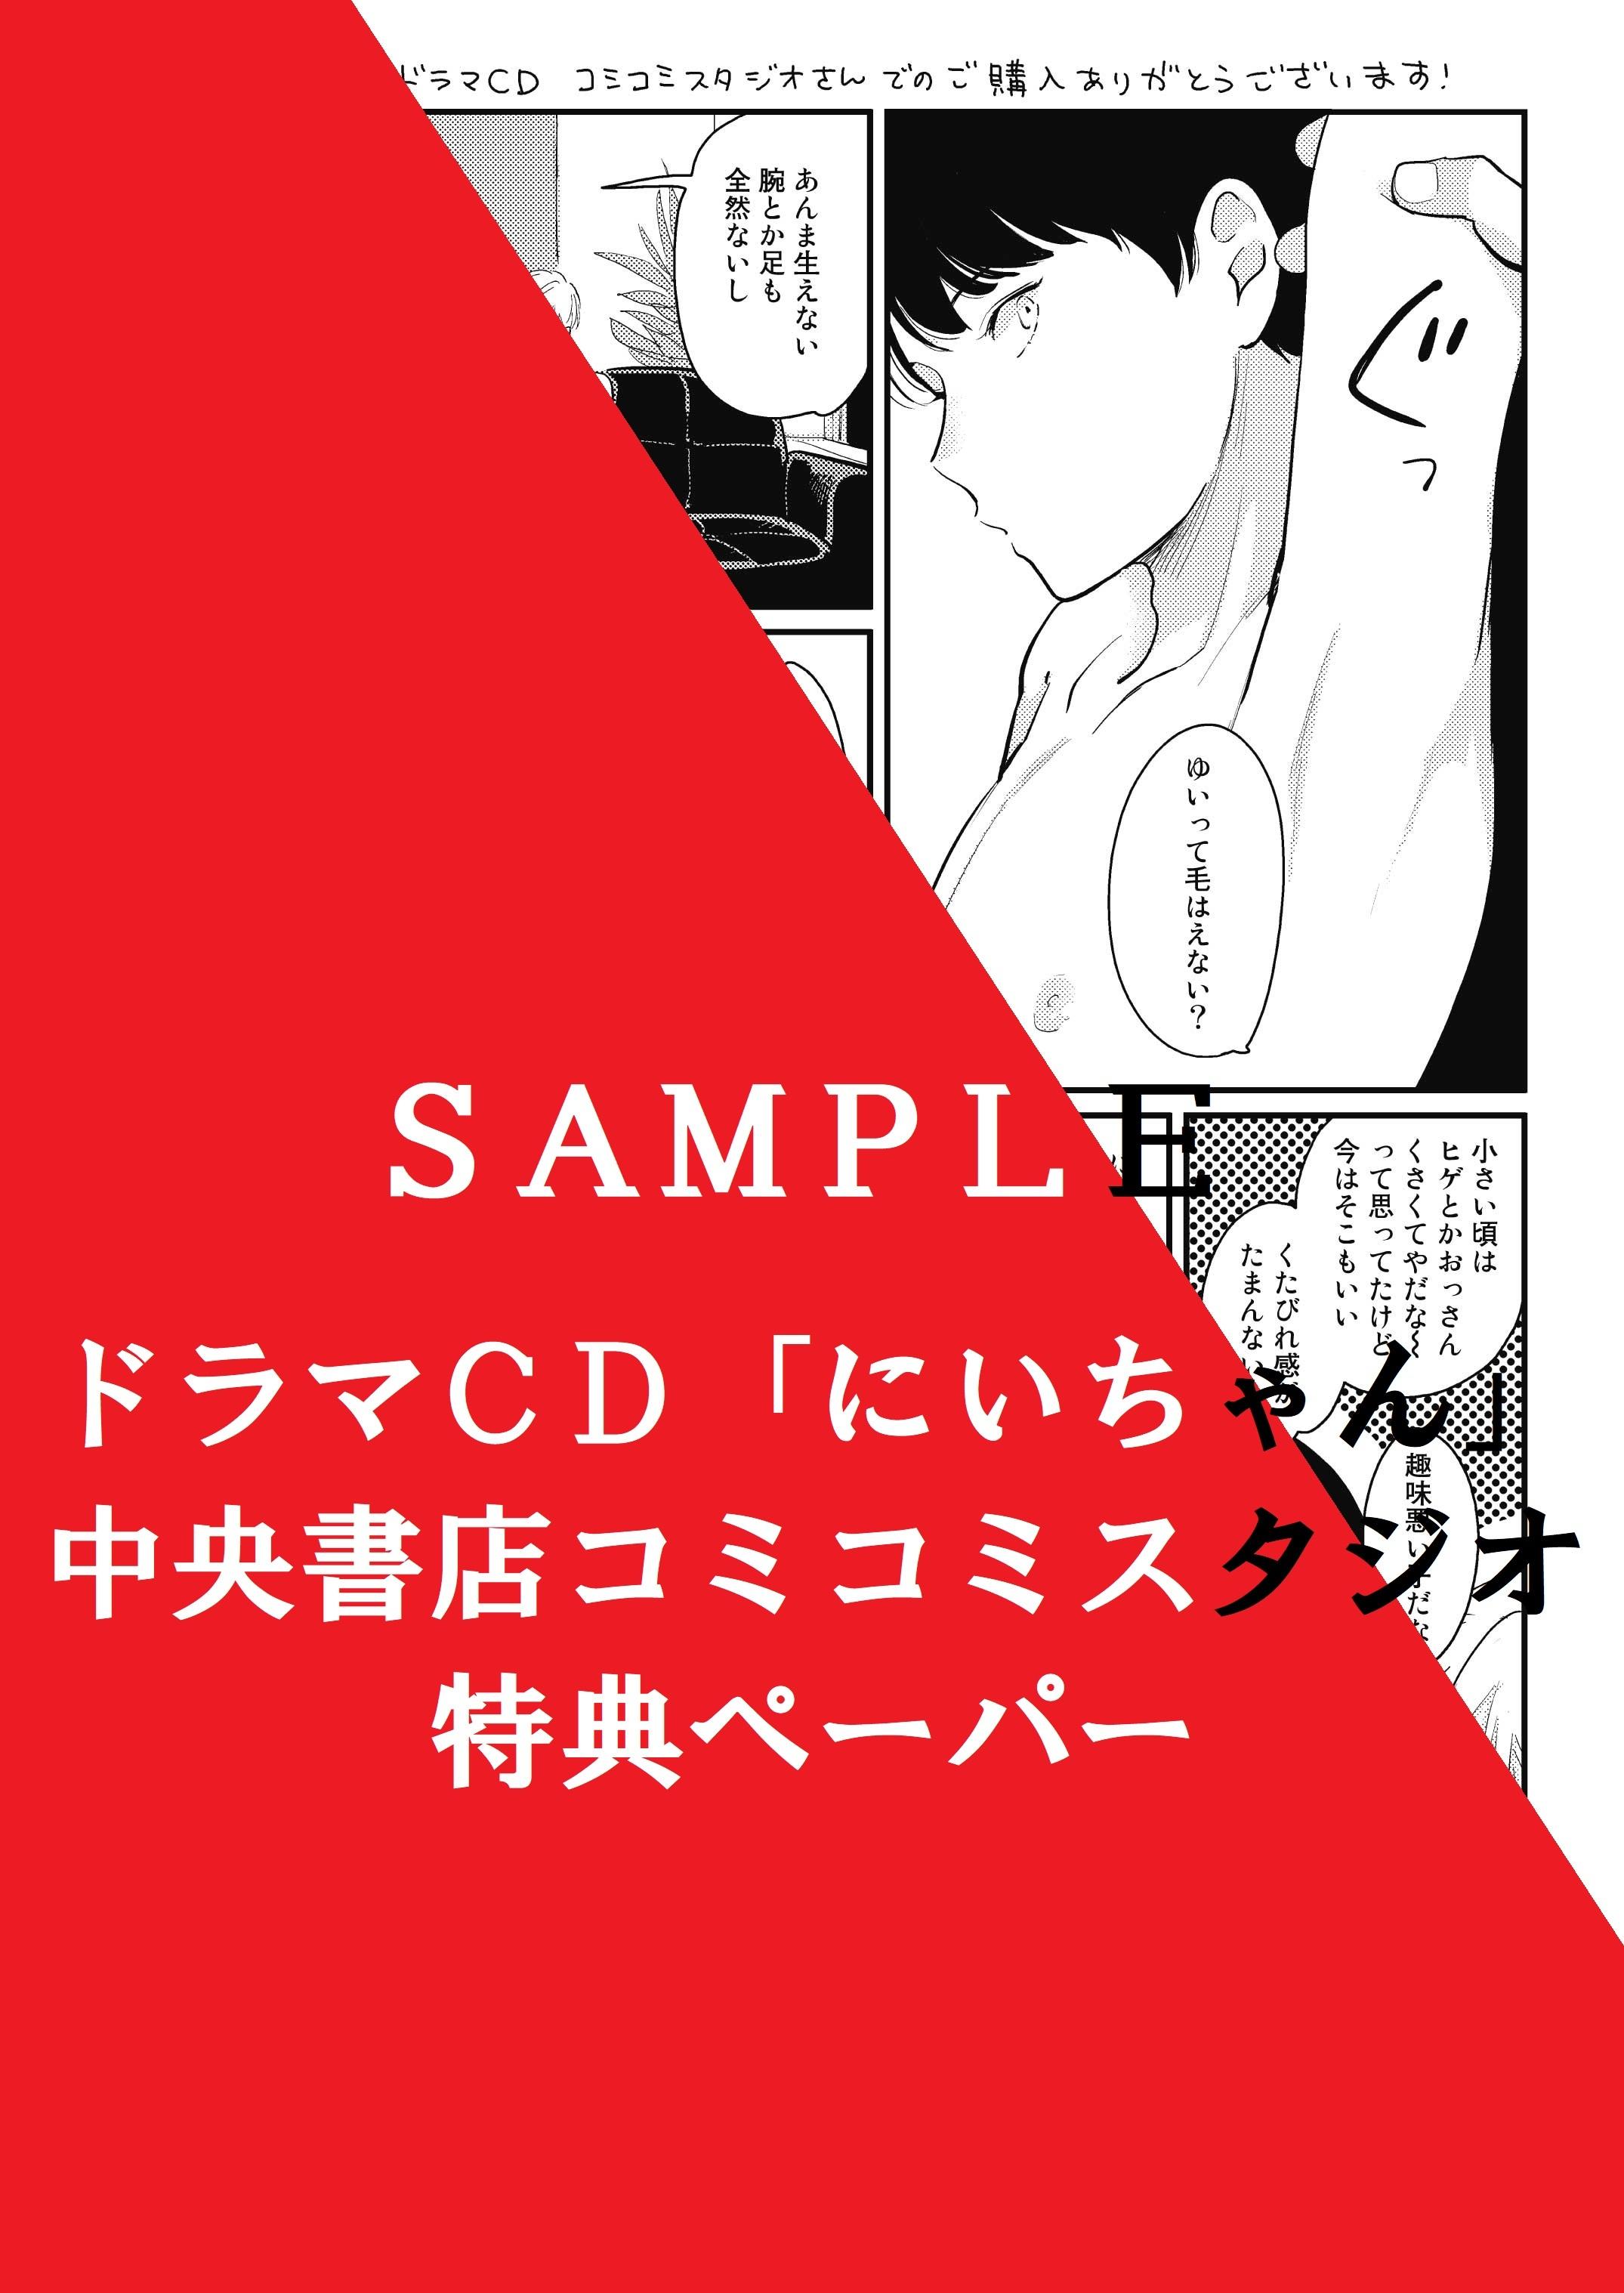 20170804153619fc9.jpg